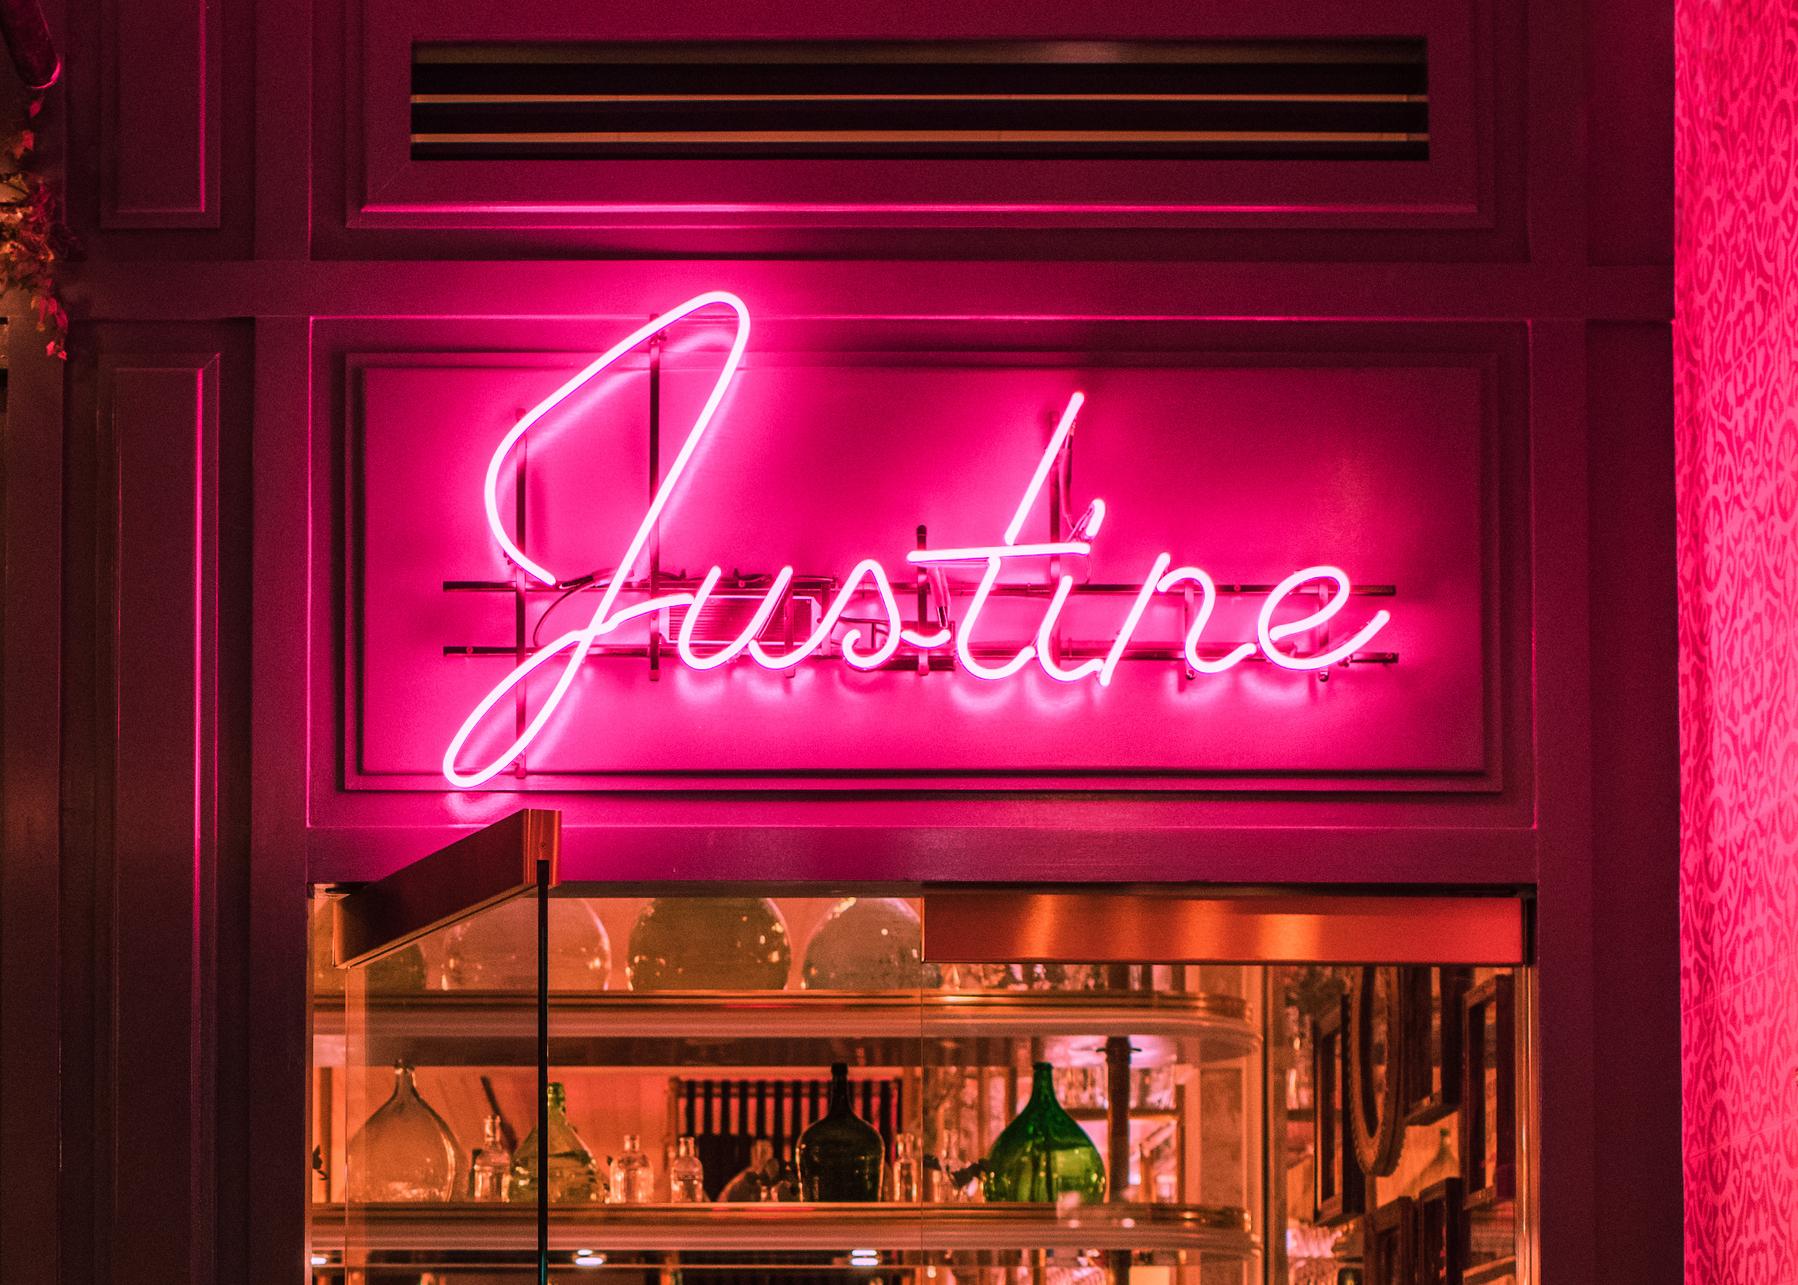 Maître D Oeuvre Orléans new orleans french quarter brasserie menu — justine